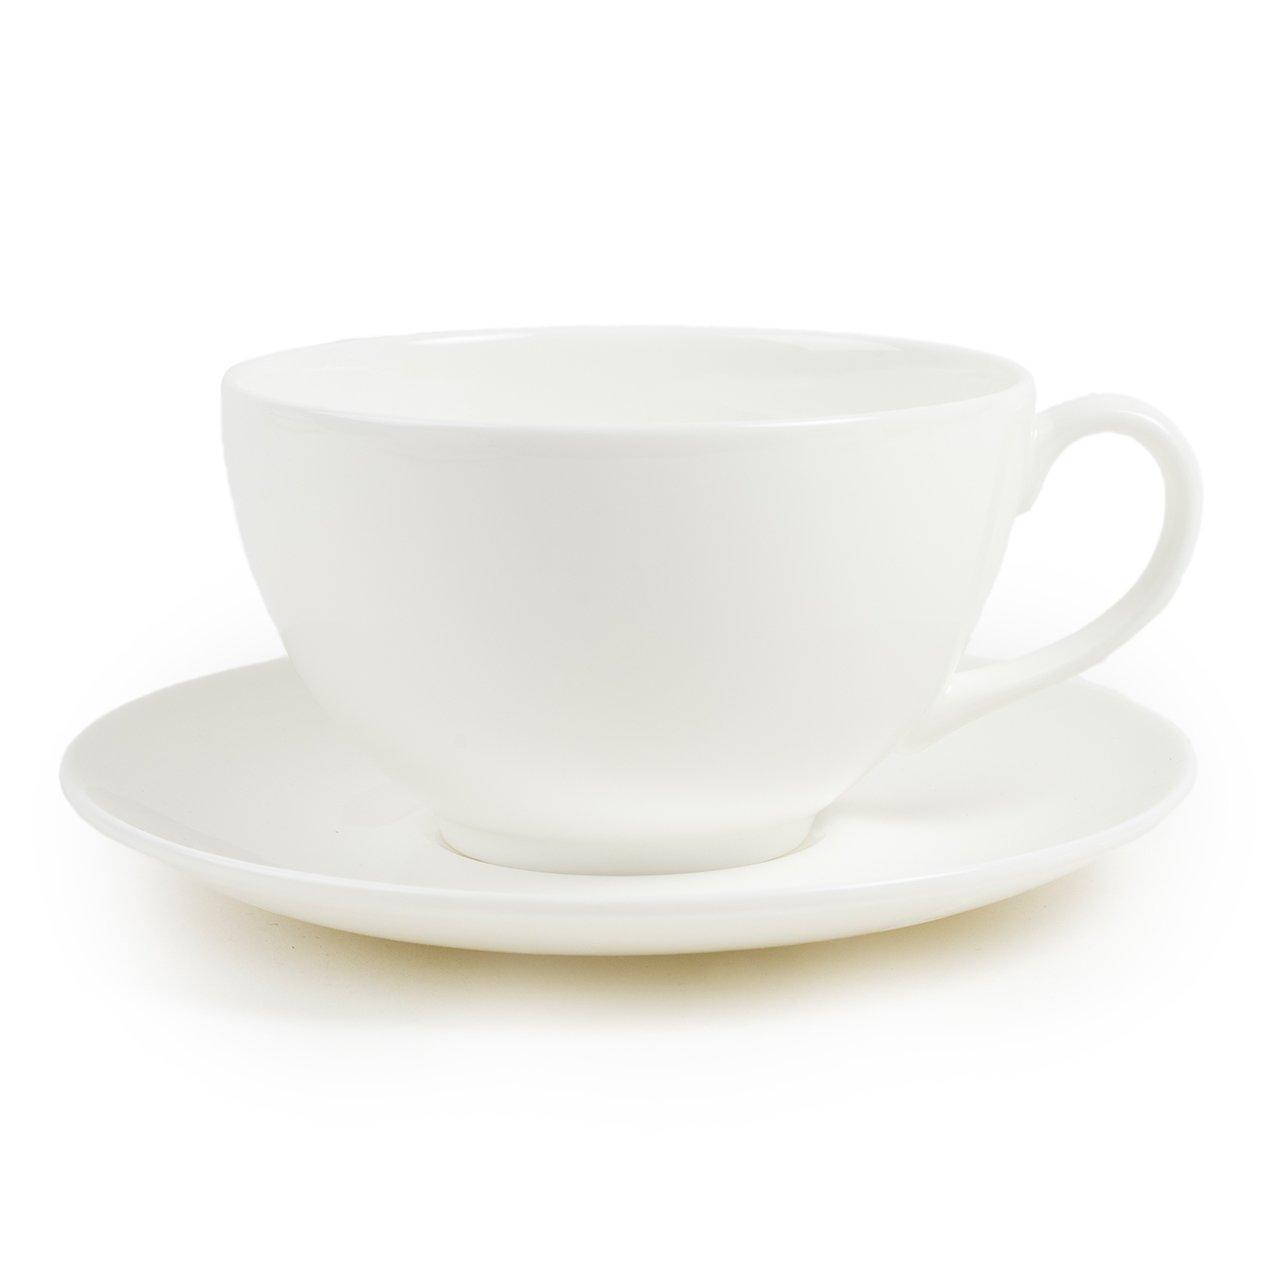 Cup Saucer White 1882 Ltd